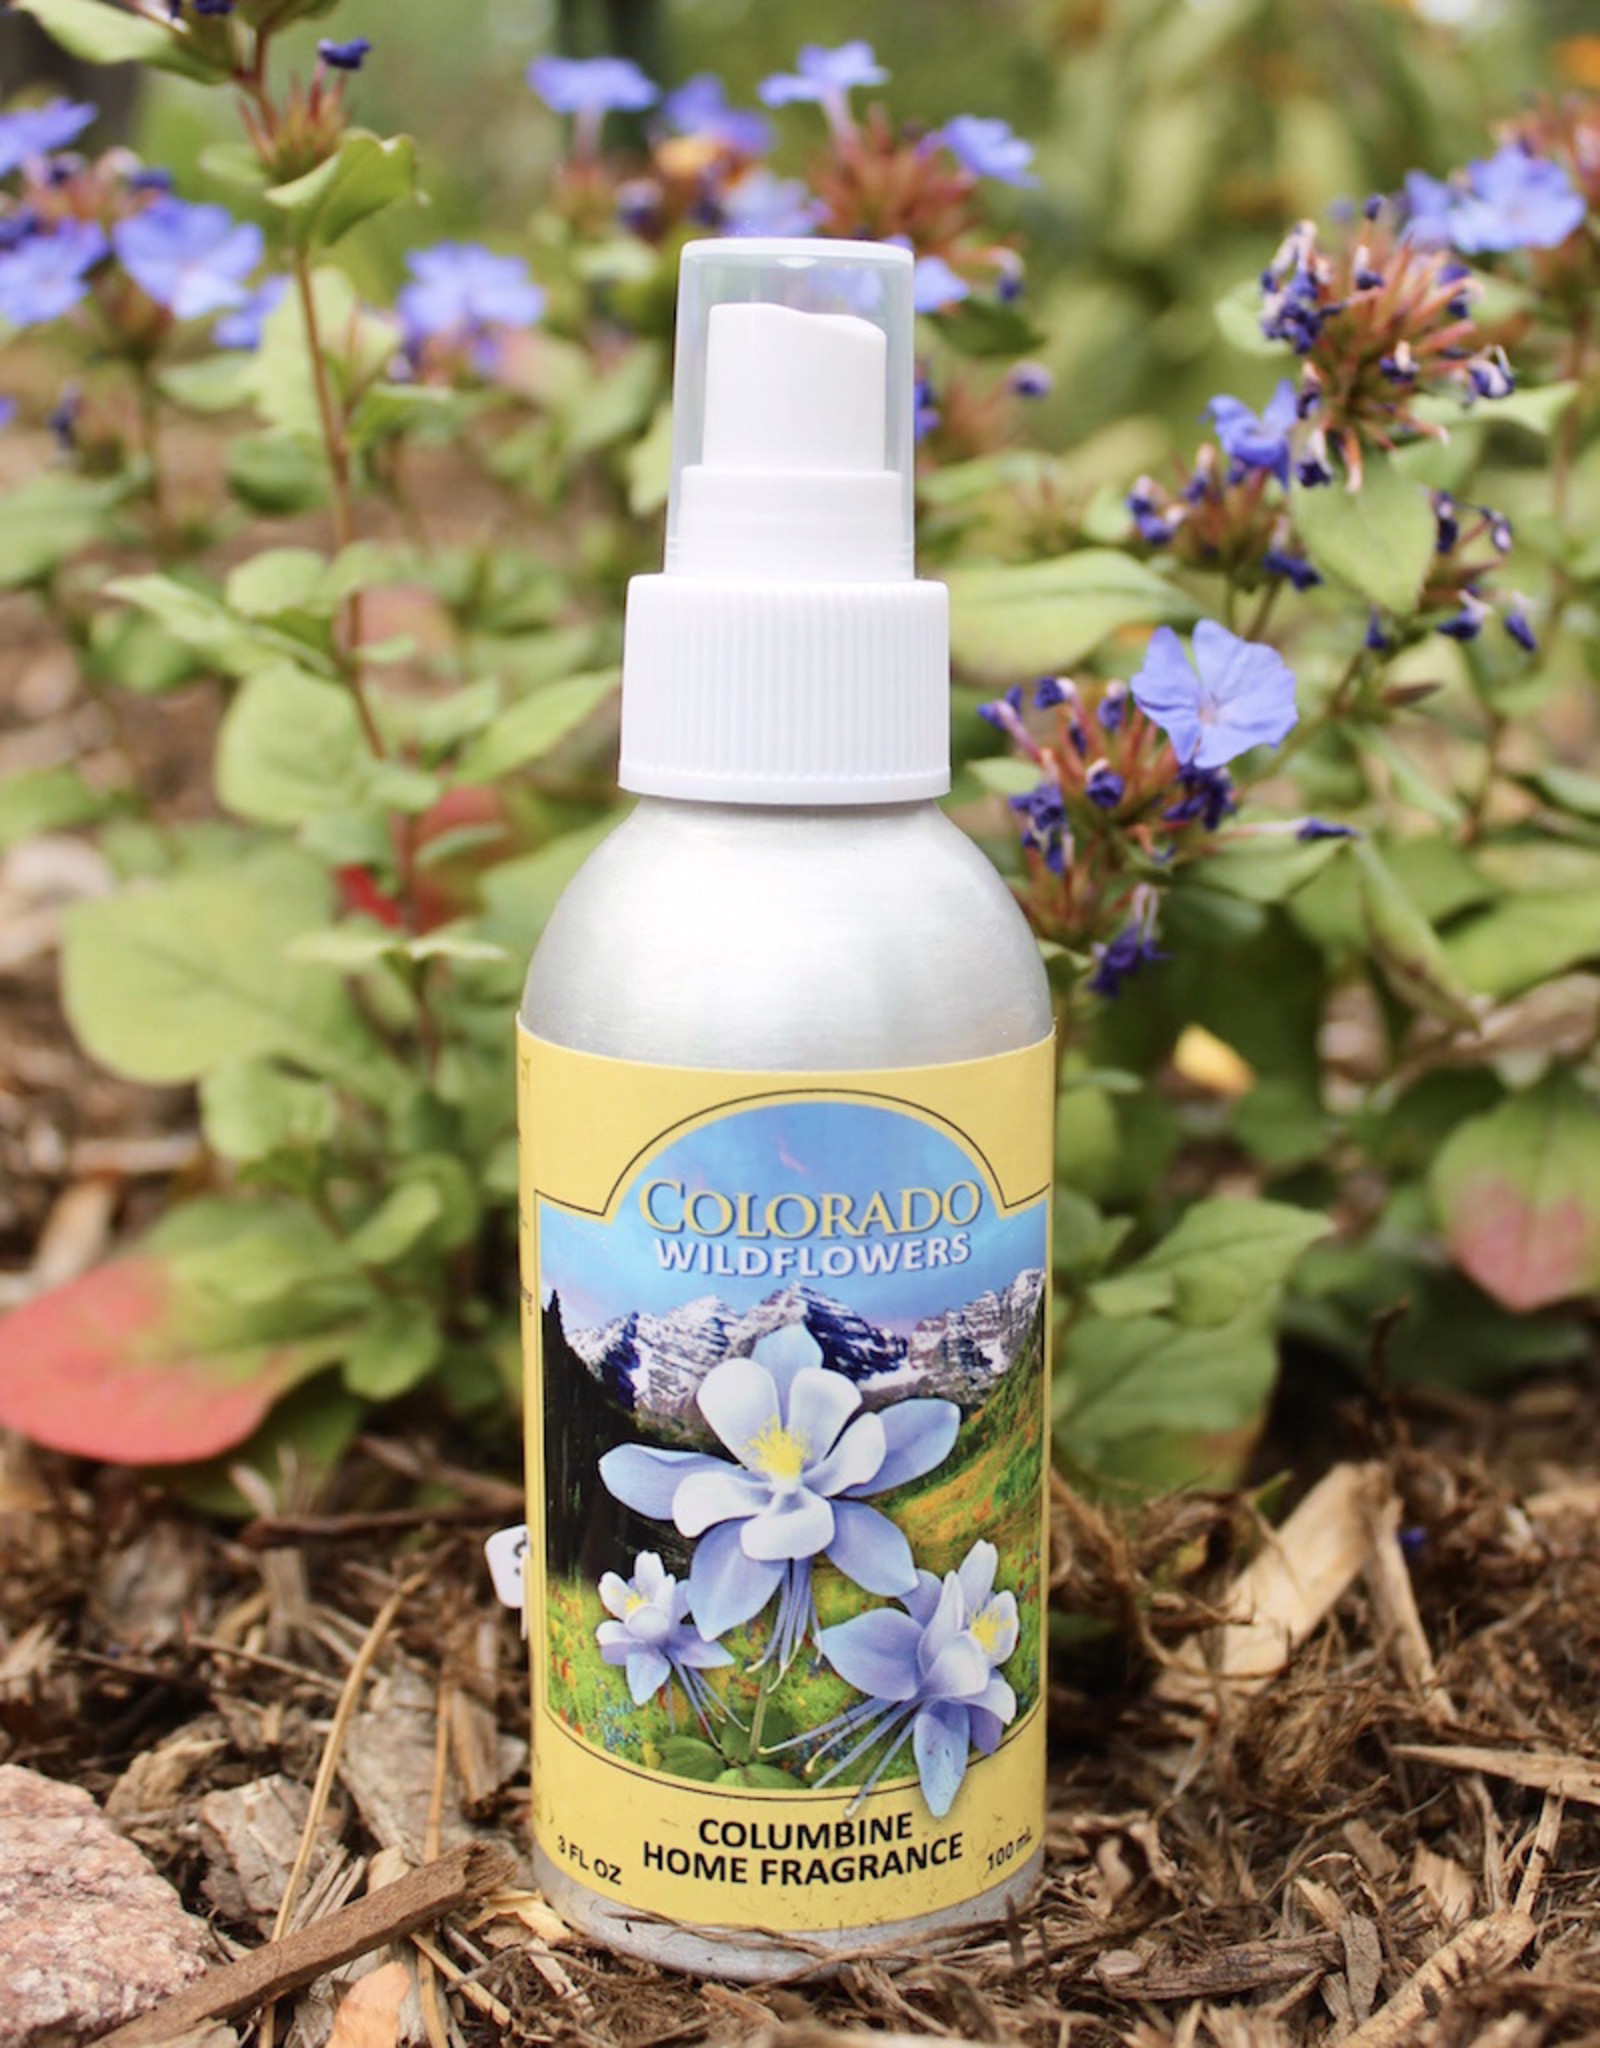 Colorado Columbine Home Fragrance